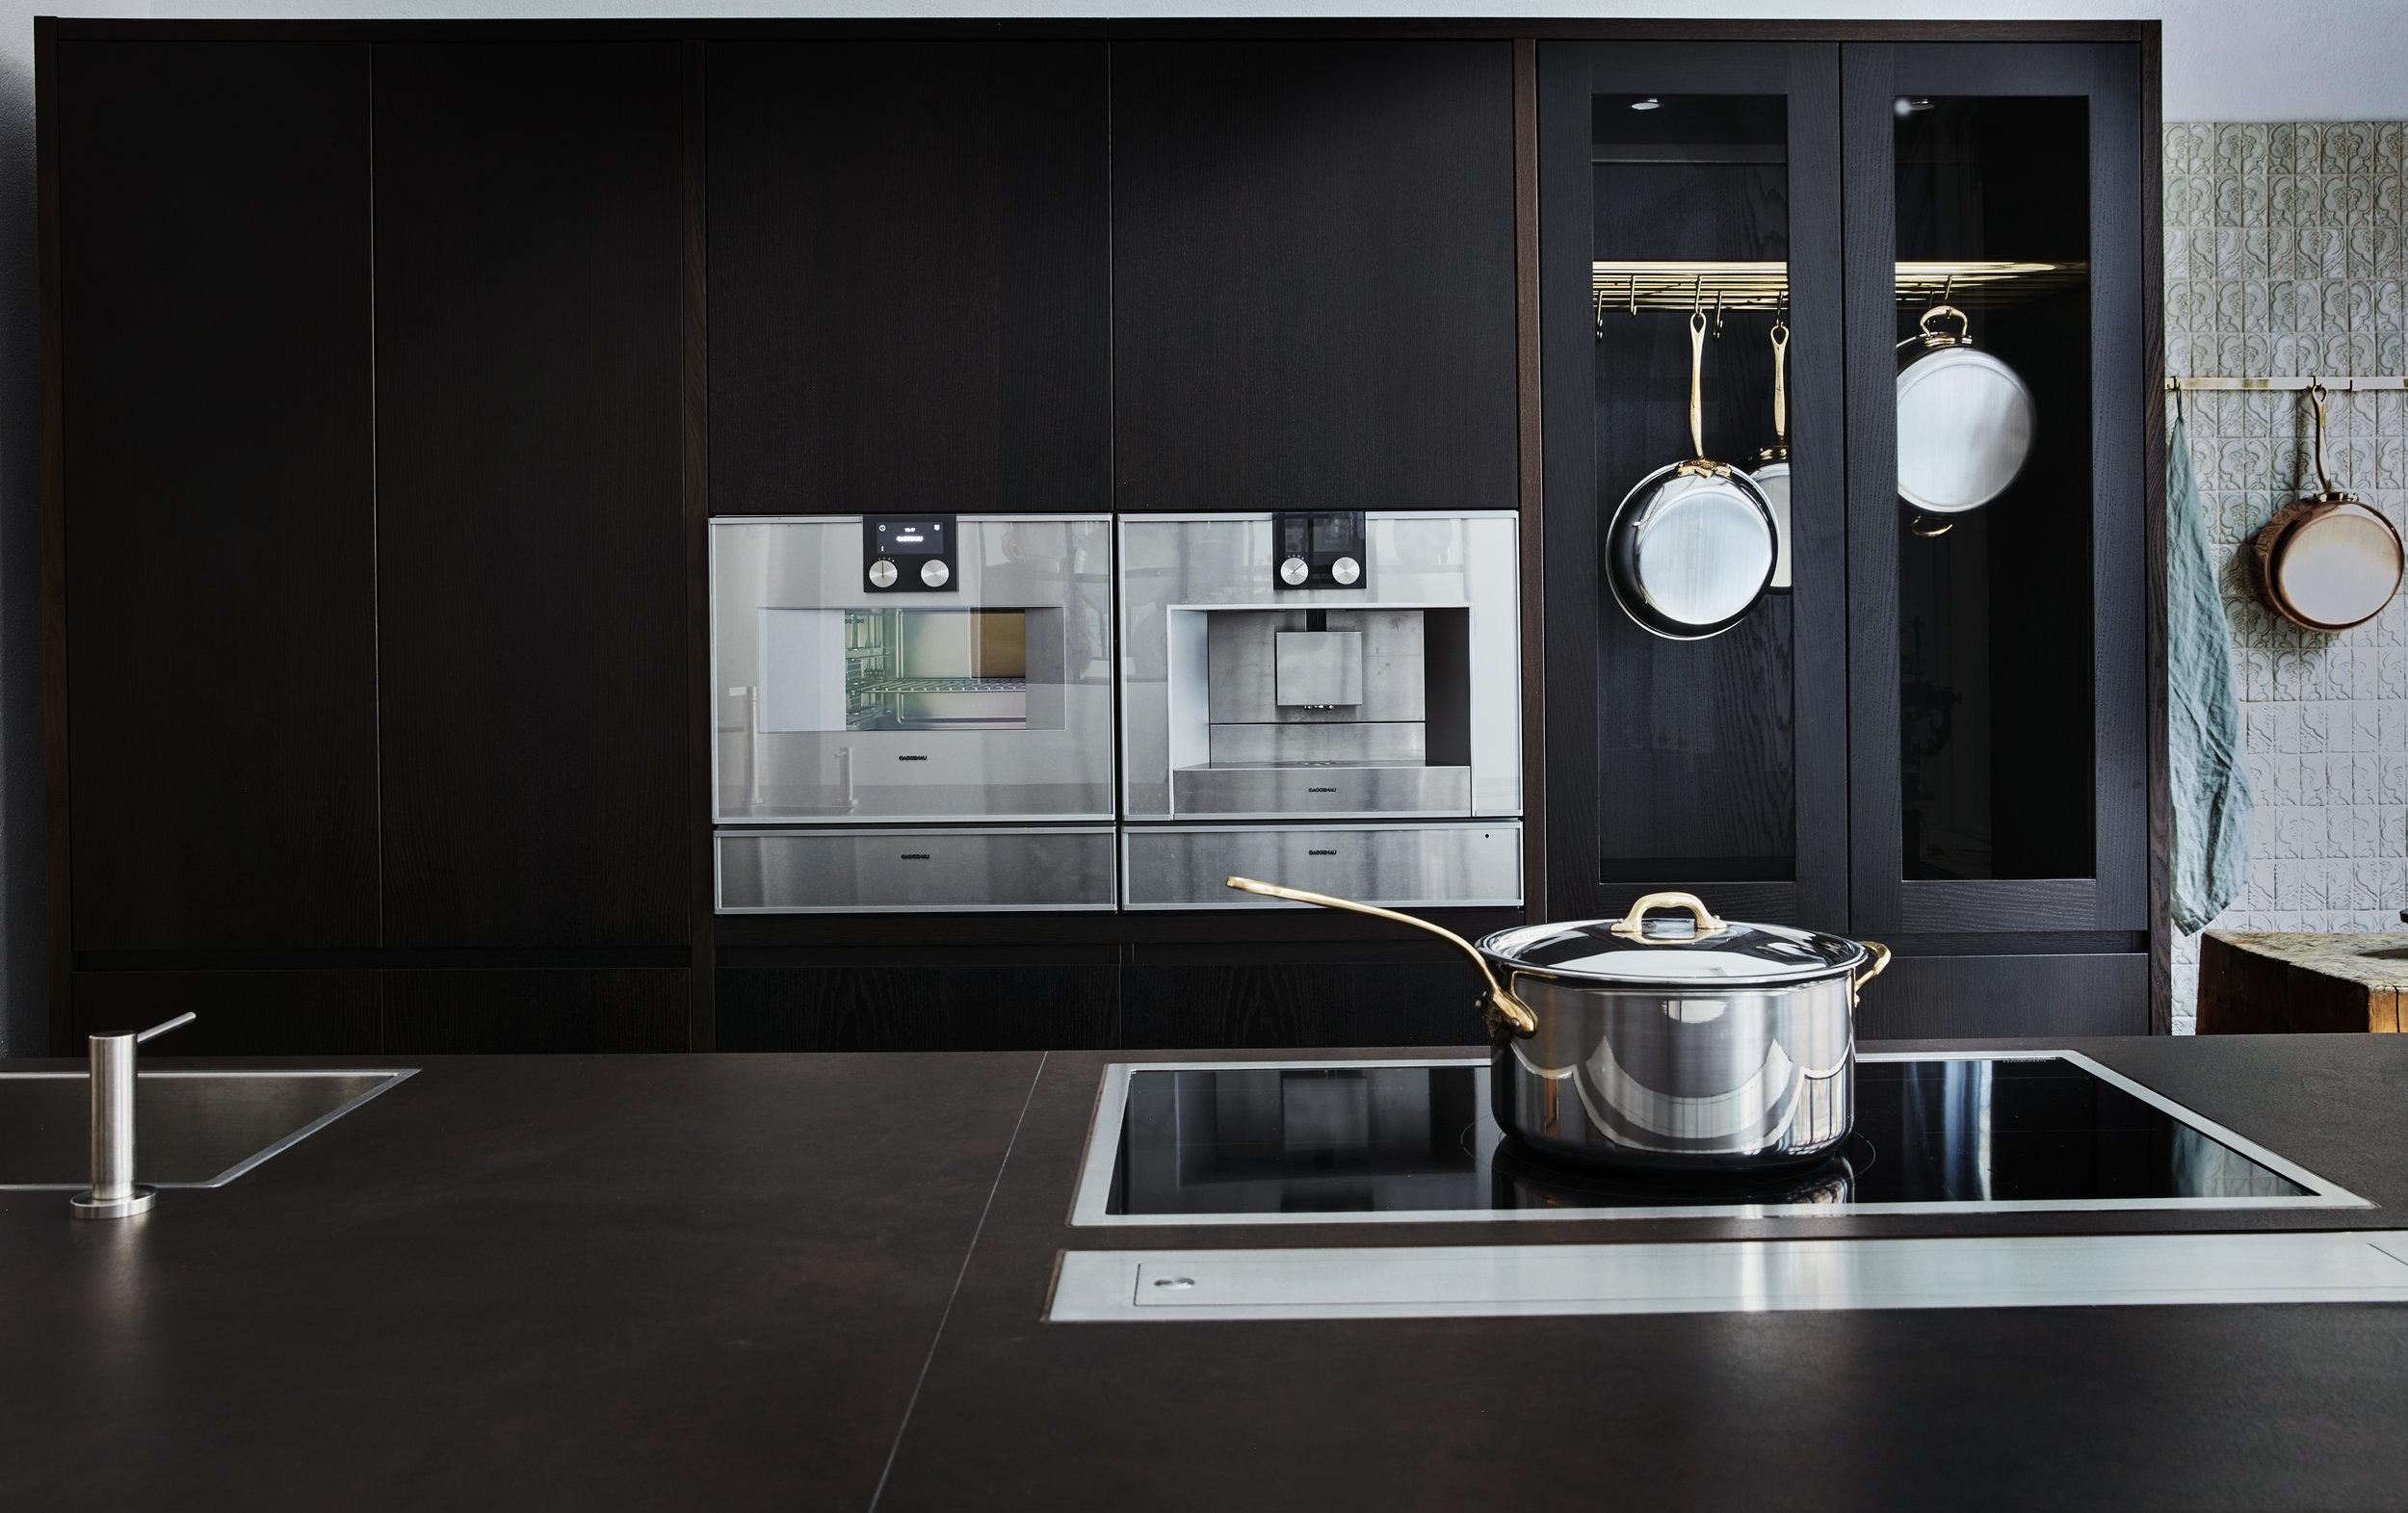 Kitchen and beyond-32.jpg